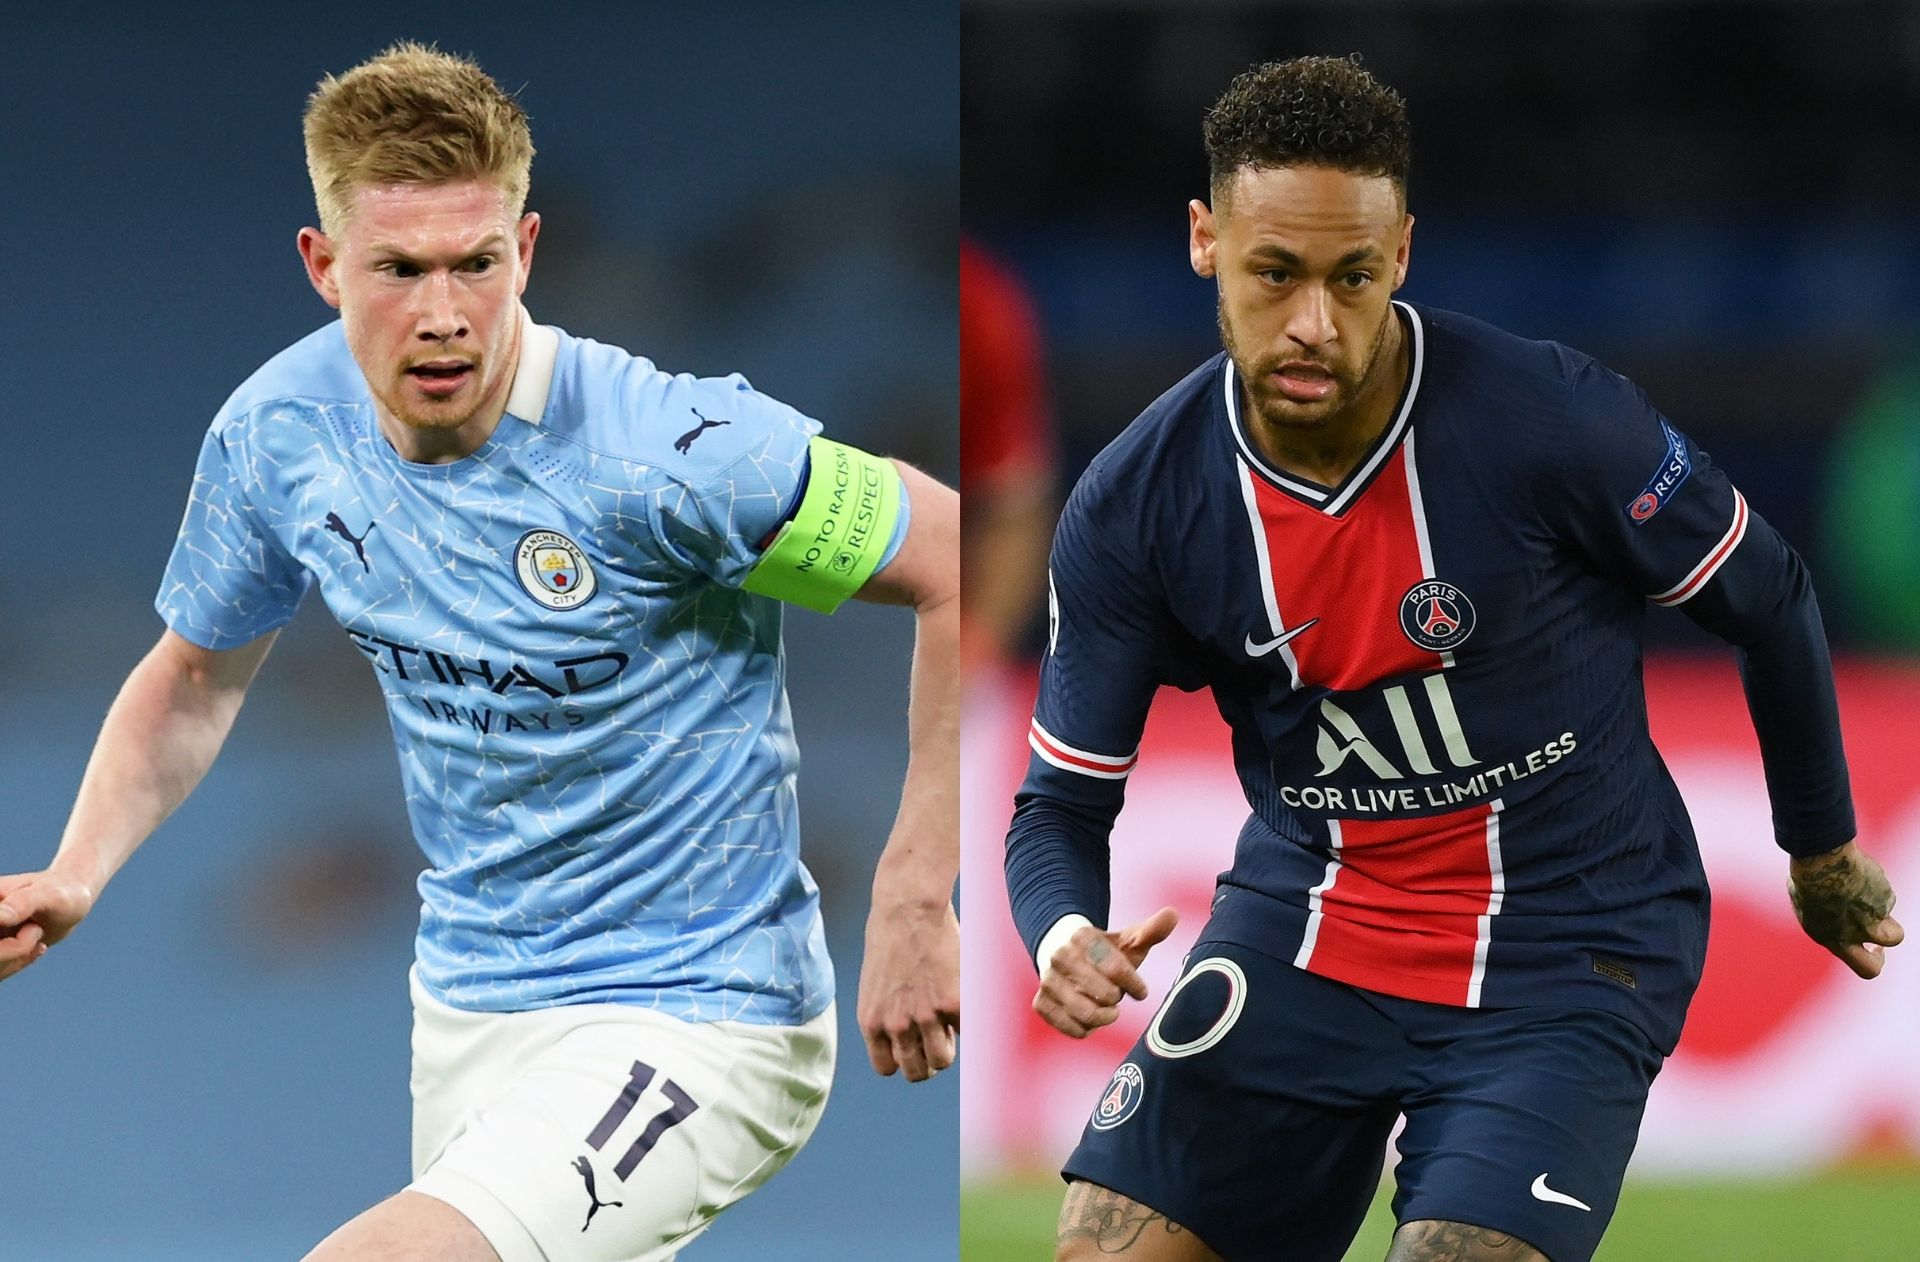 Man City vs PSG - Champions League